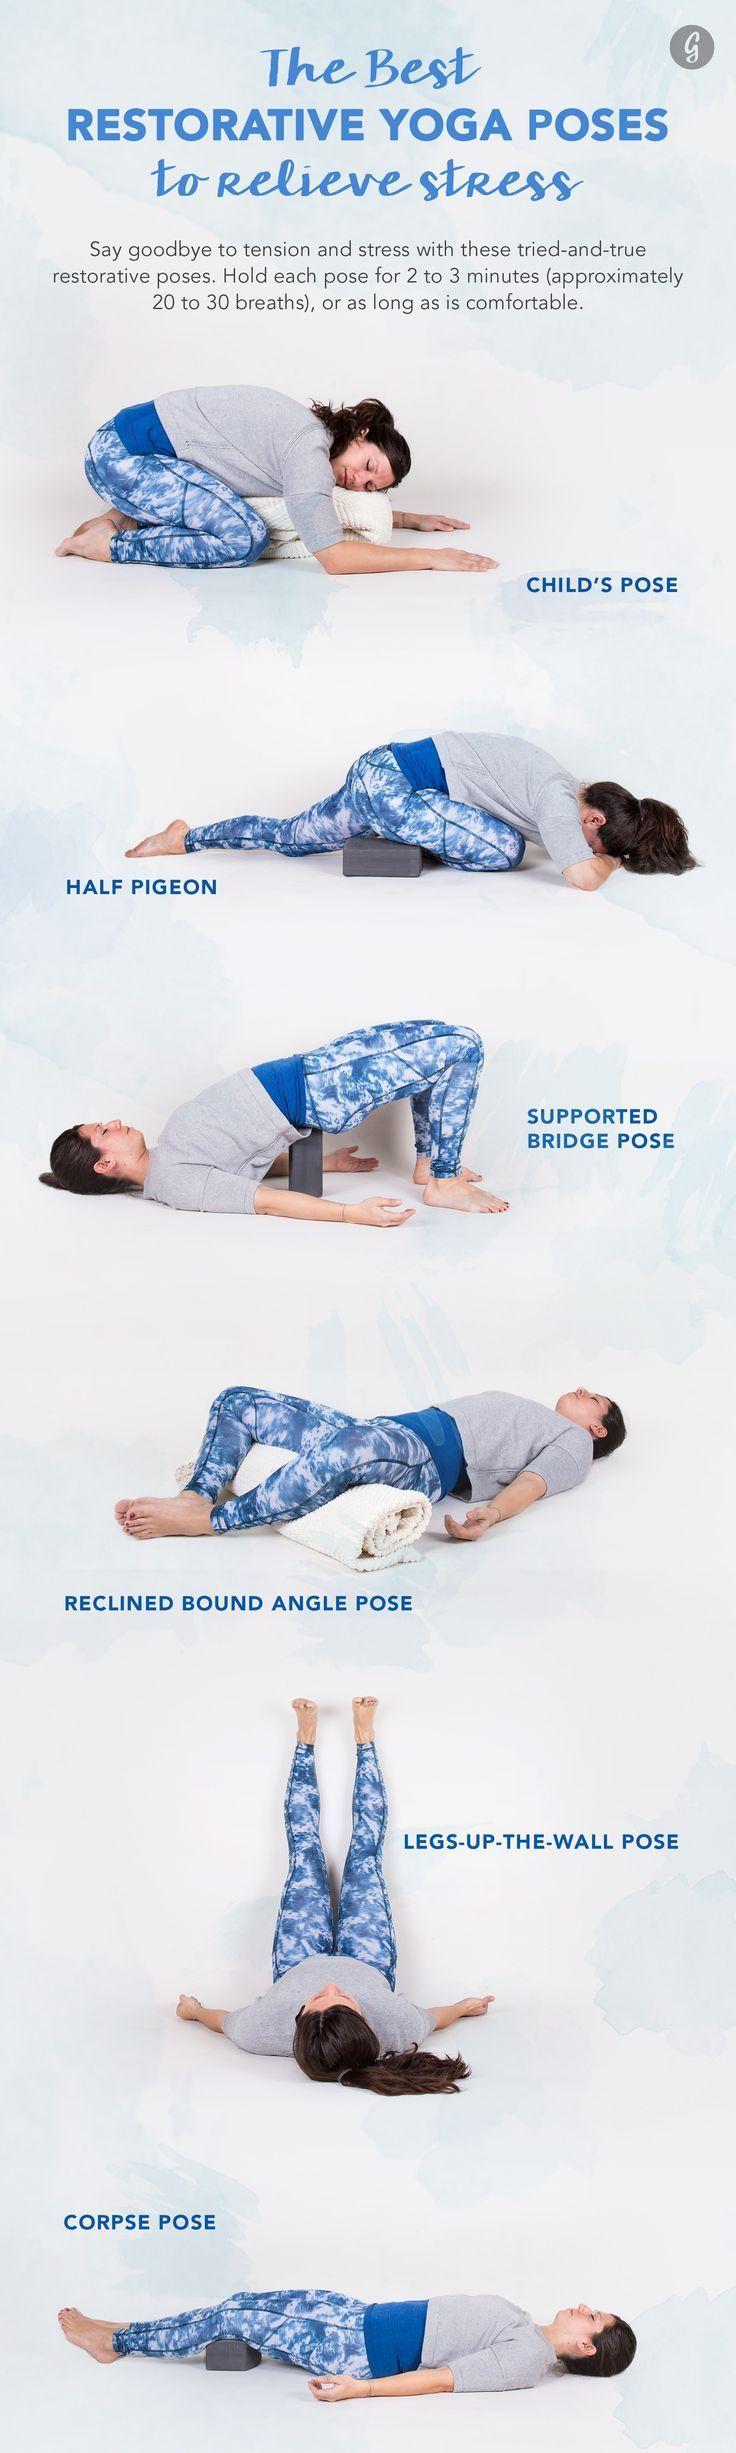 The Best Restorative Yoga Poses Restorative Yoga Workout Fitness Deals Restorative Yoga Yoga Poses Restorative Yoga Poses